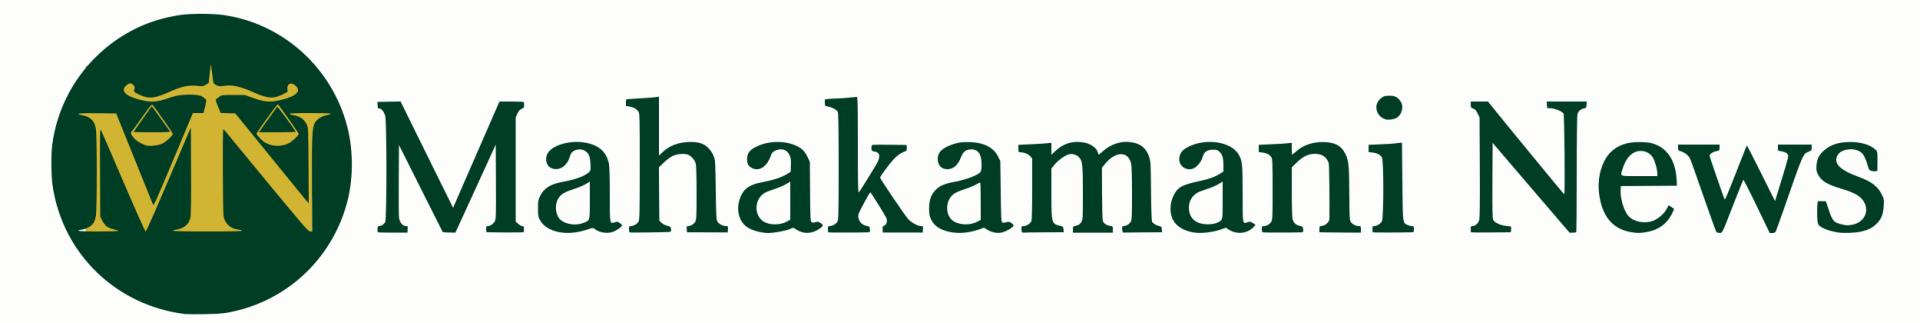 Mahakamani News